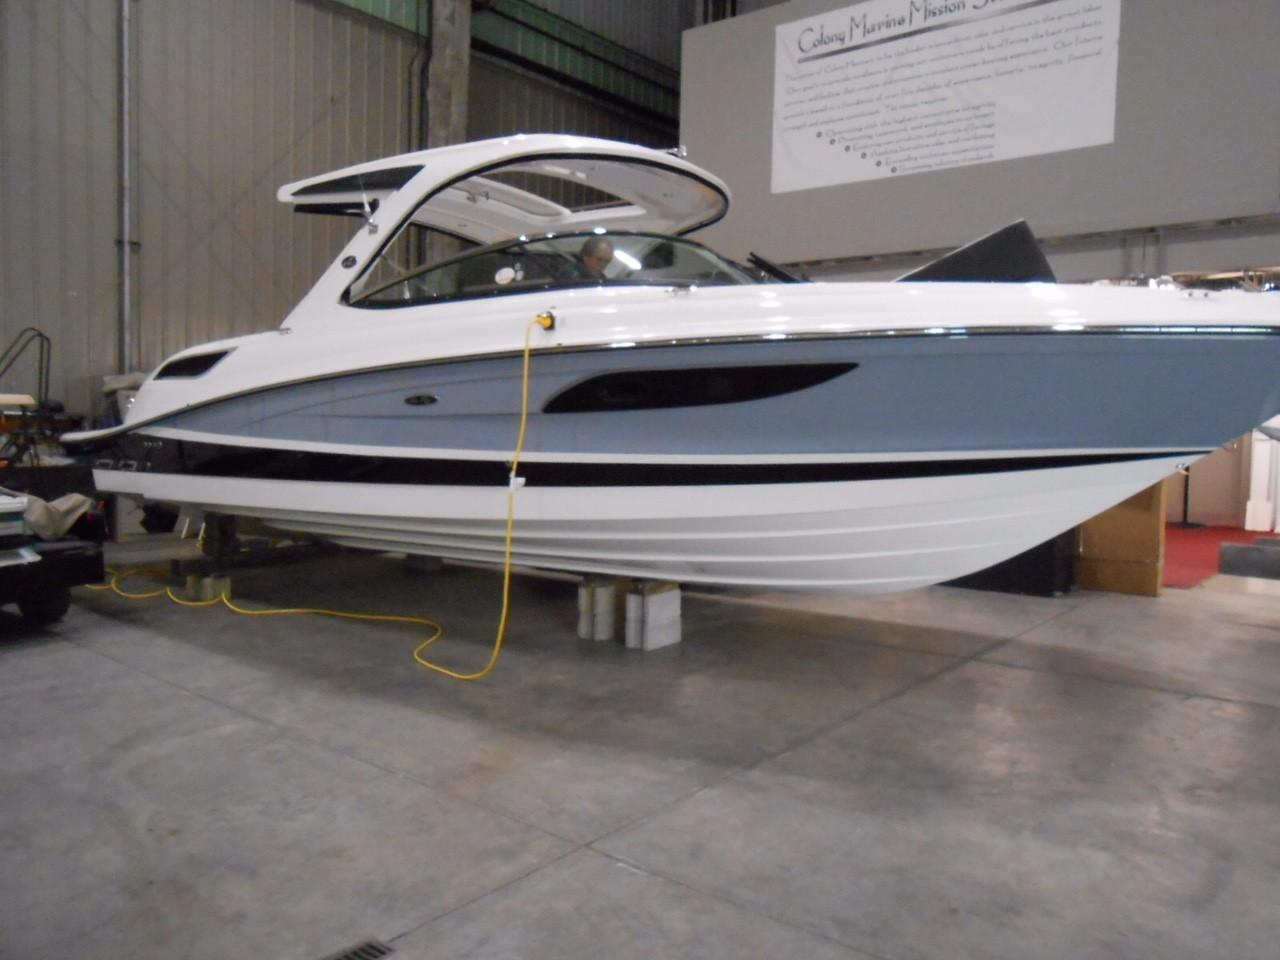 sea ray warranty liftmaster garage door opener 2017 350 slx power boat for sale yachtworld